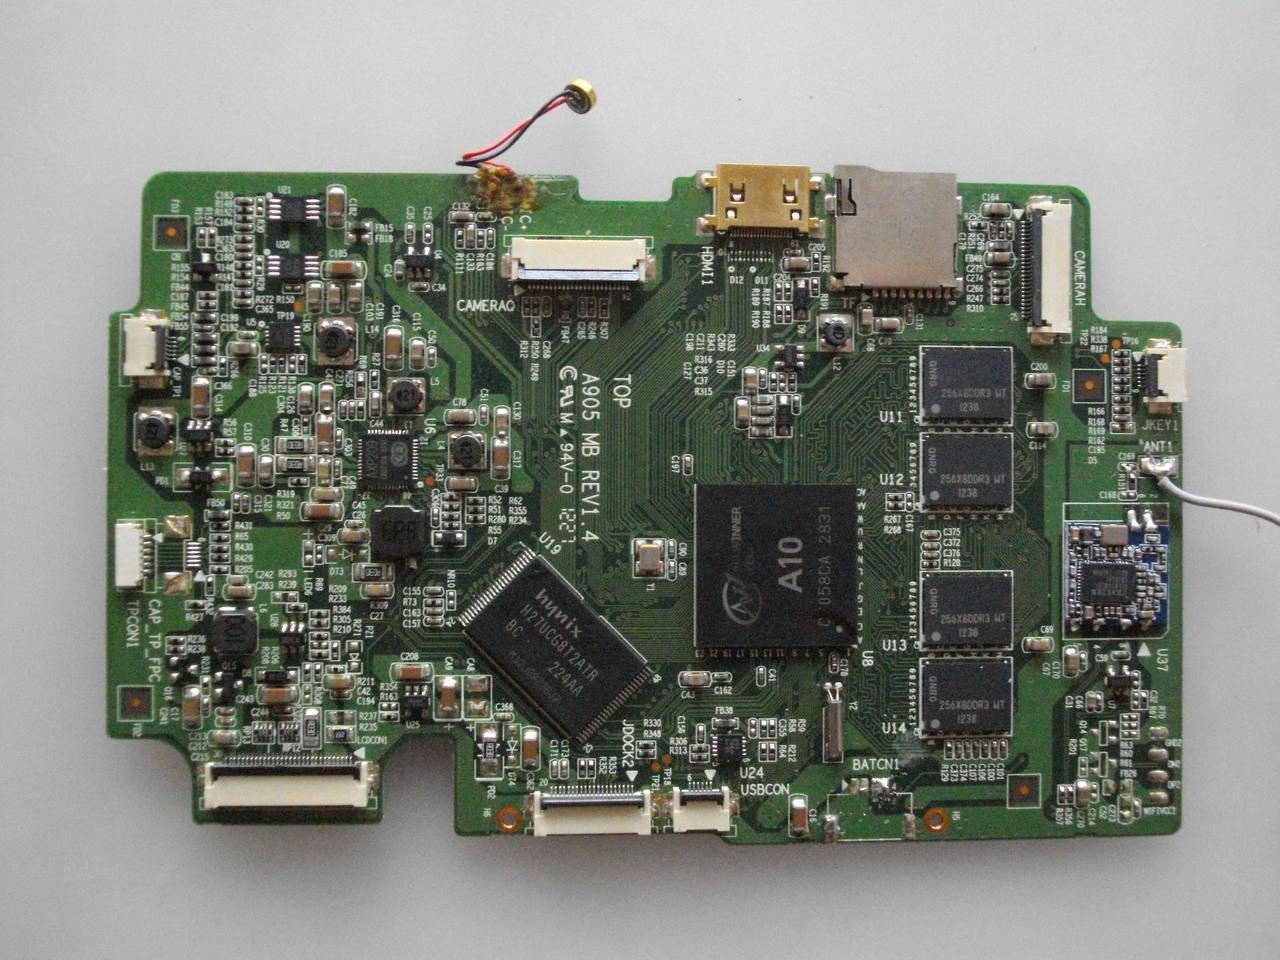 Материнська плата A905MB rev1.4 для планшета Impression ImPad 9701, 9701/16 бо робоча.